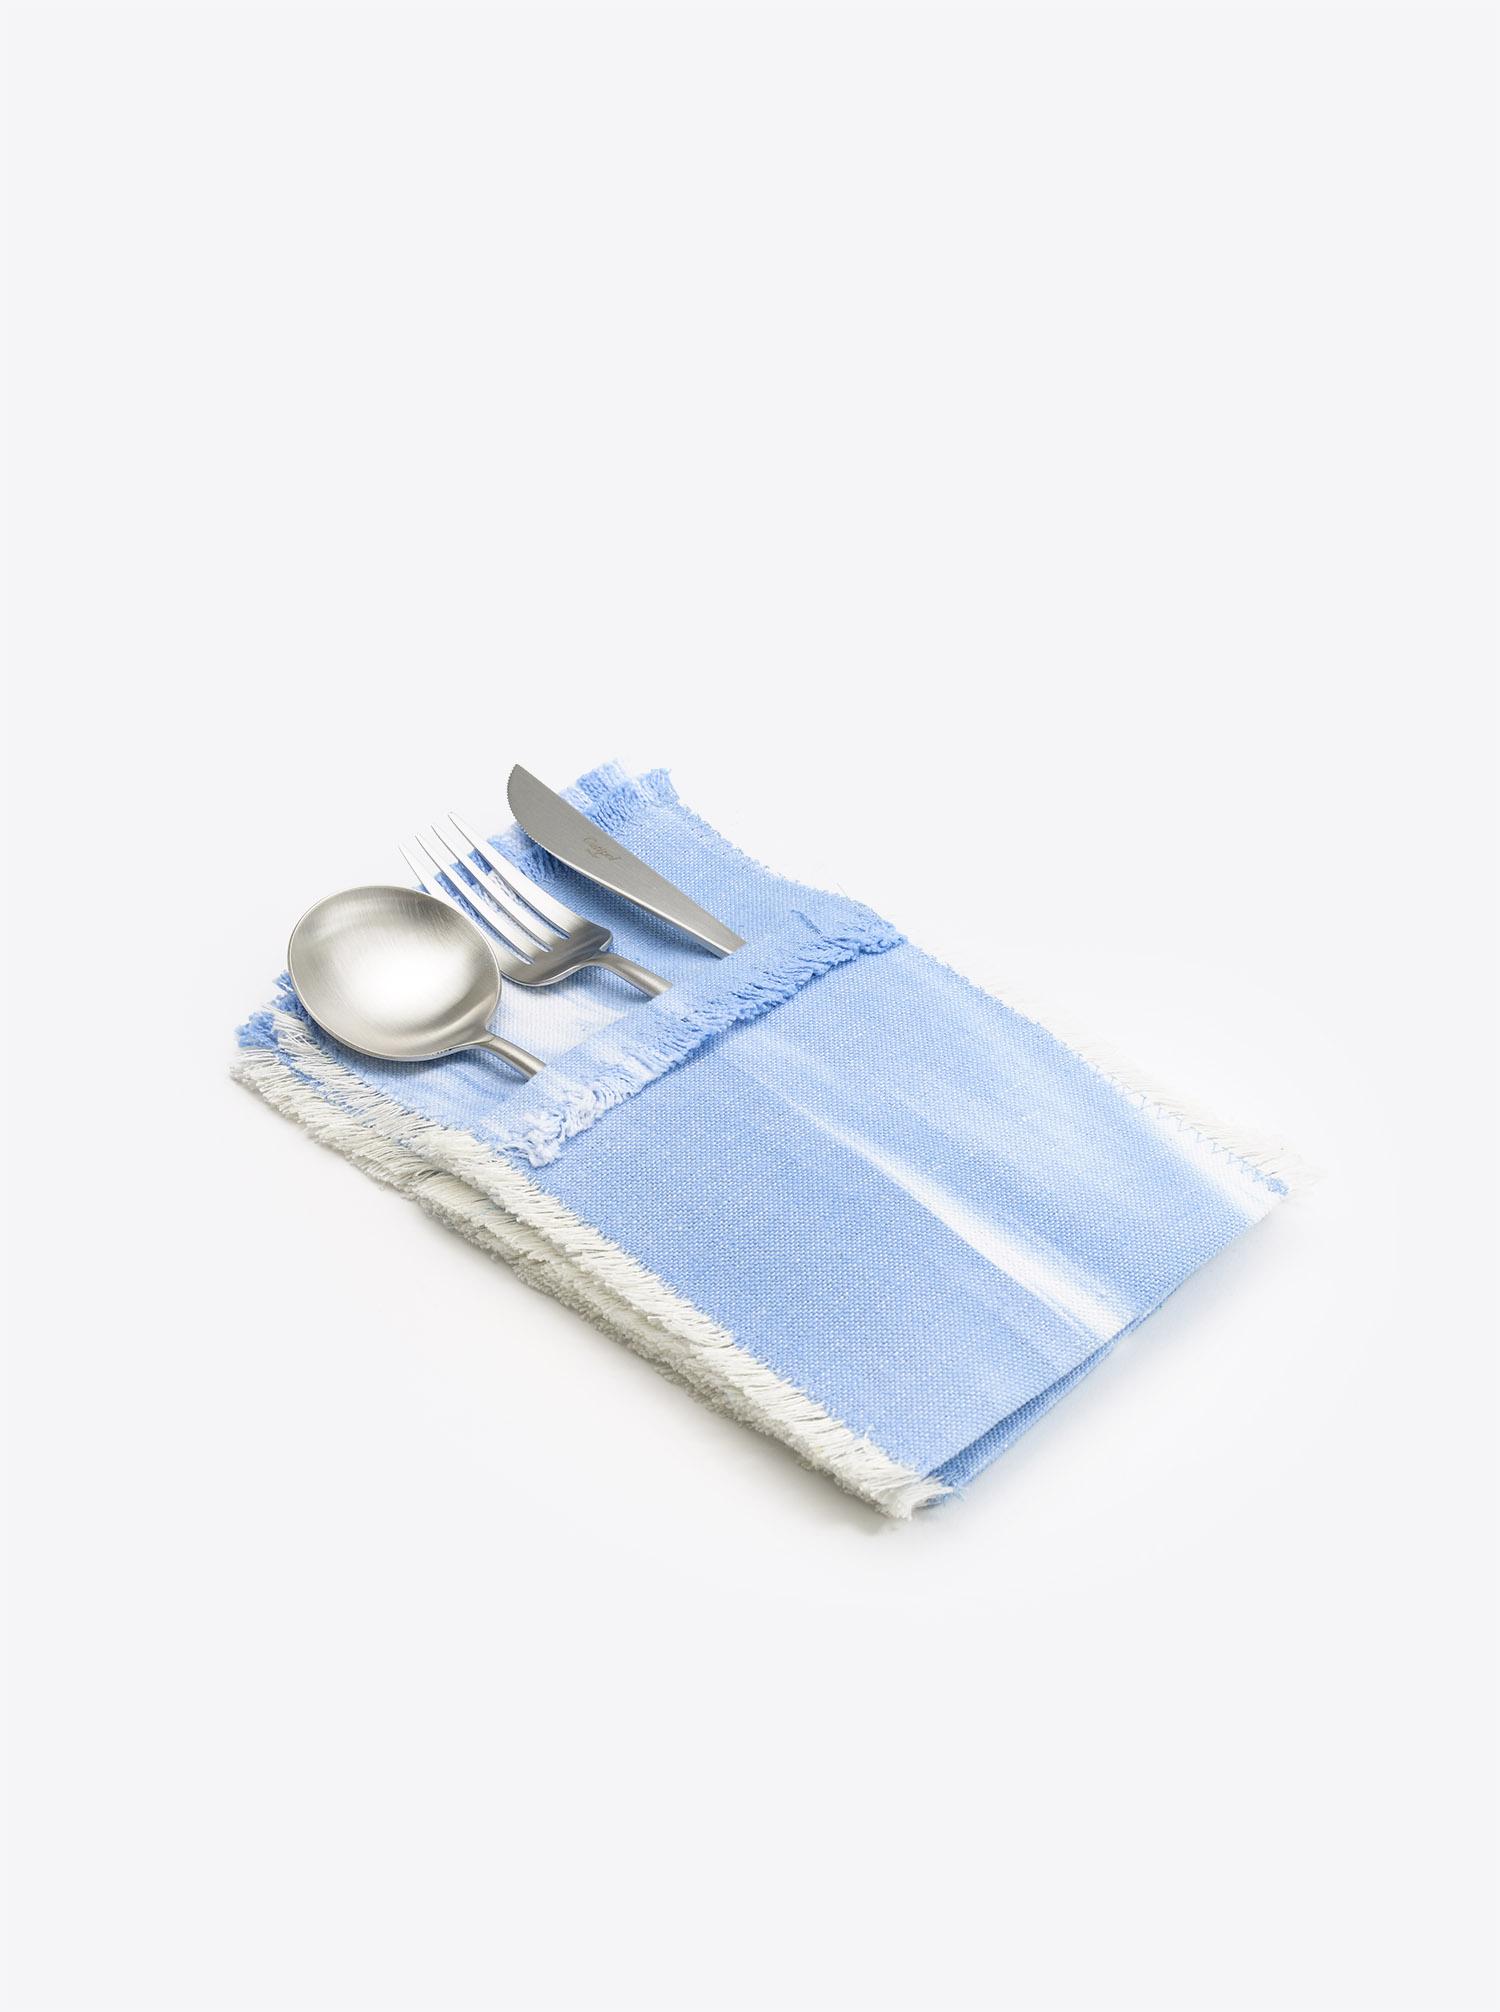 "Cutlery Set ""Goa"" steel"